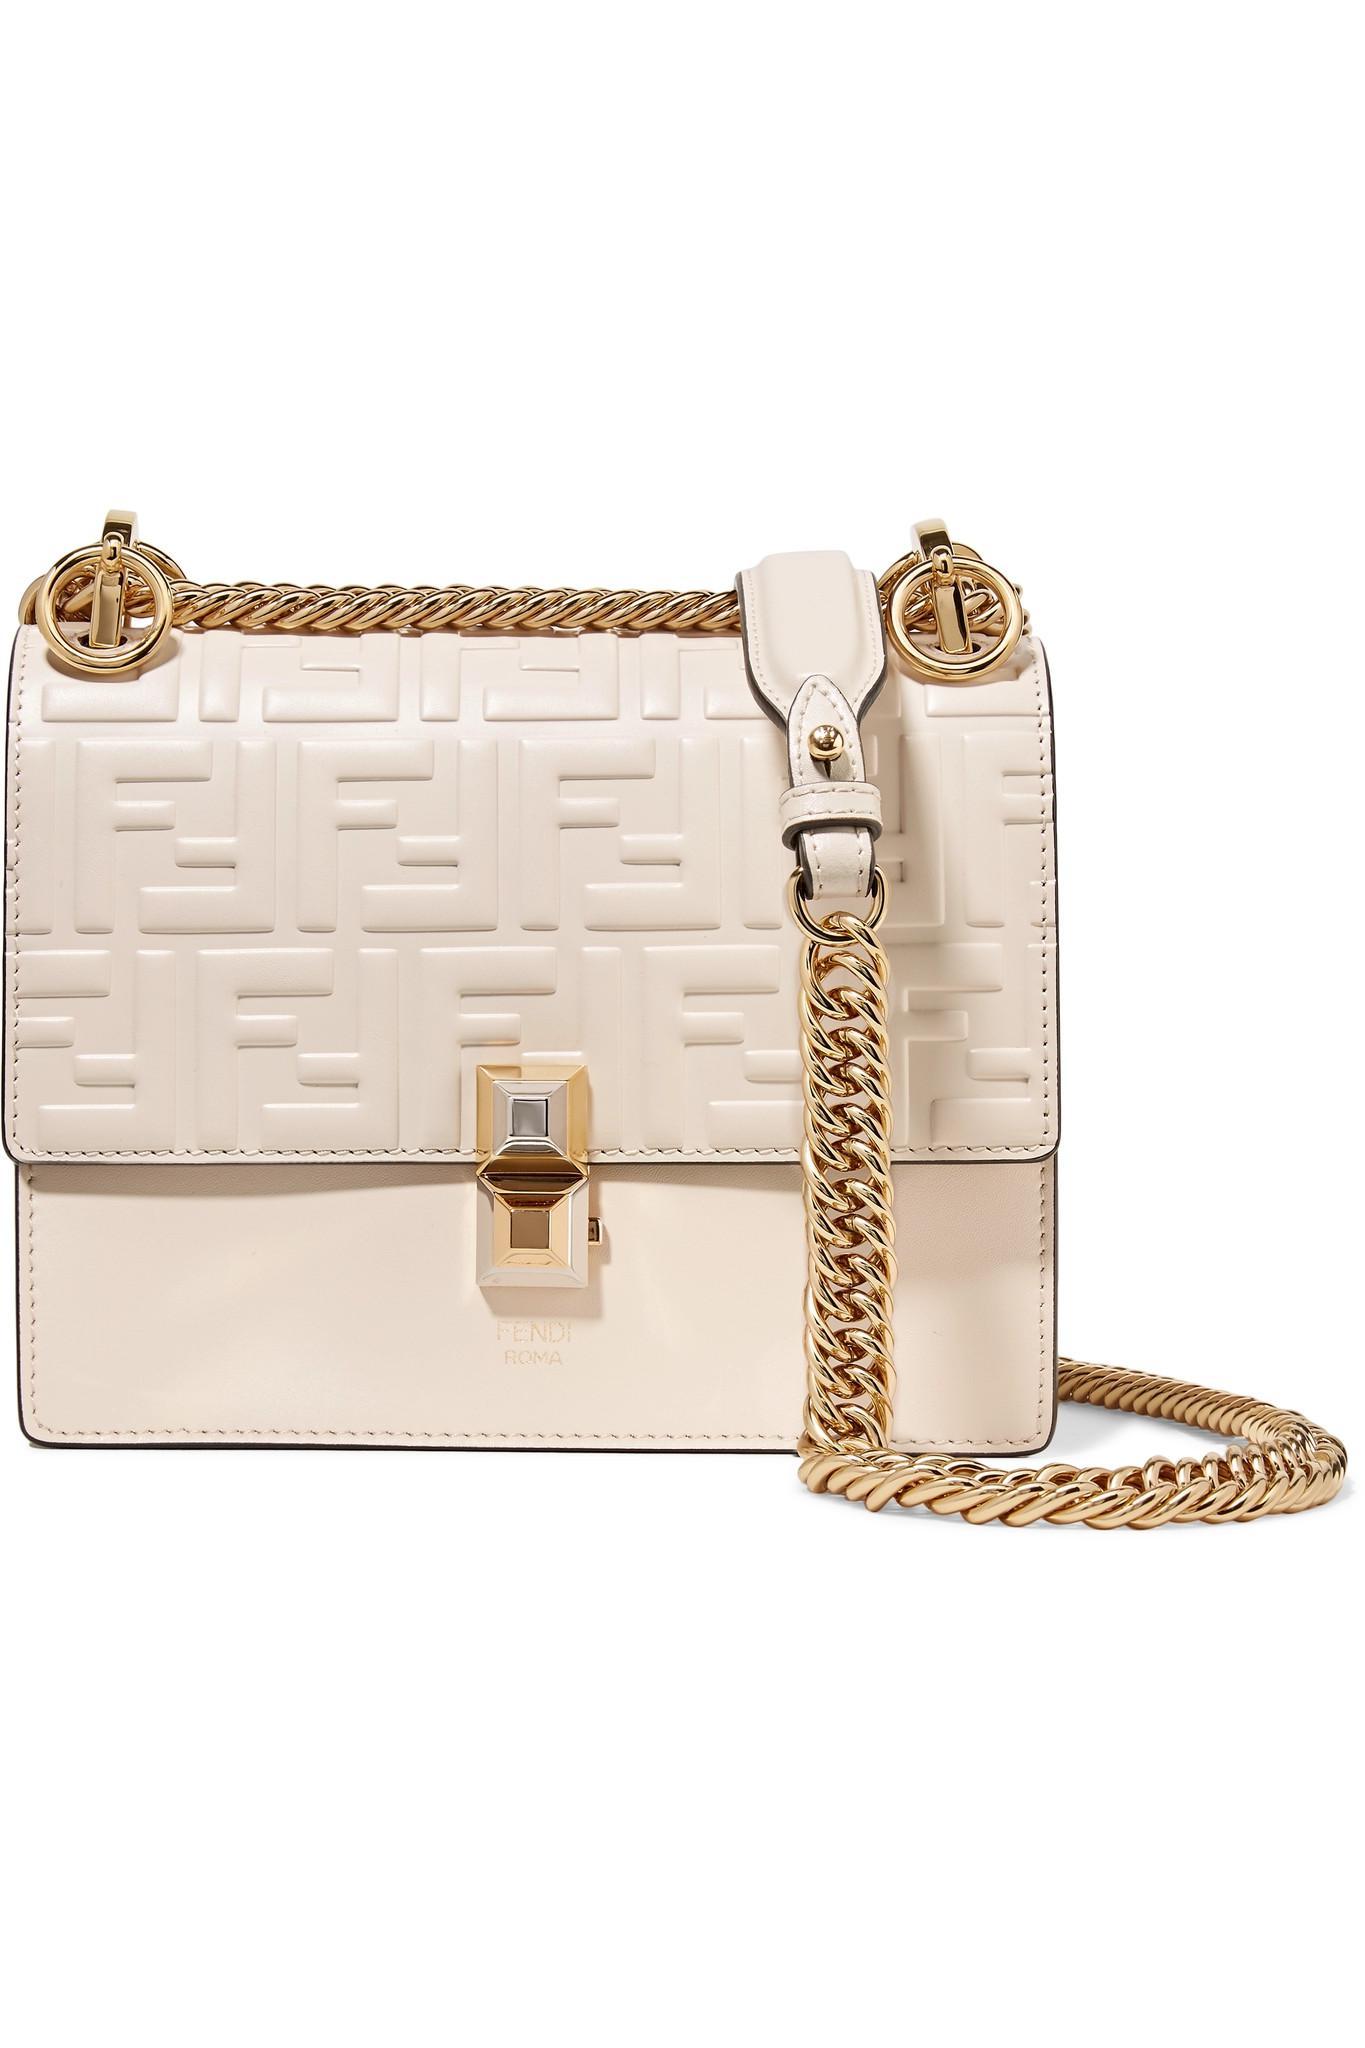 Fendi Kan I Small Embossed Leather Shoulder Bag in White - Lyst 9ca3dcf4cbb4b